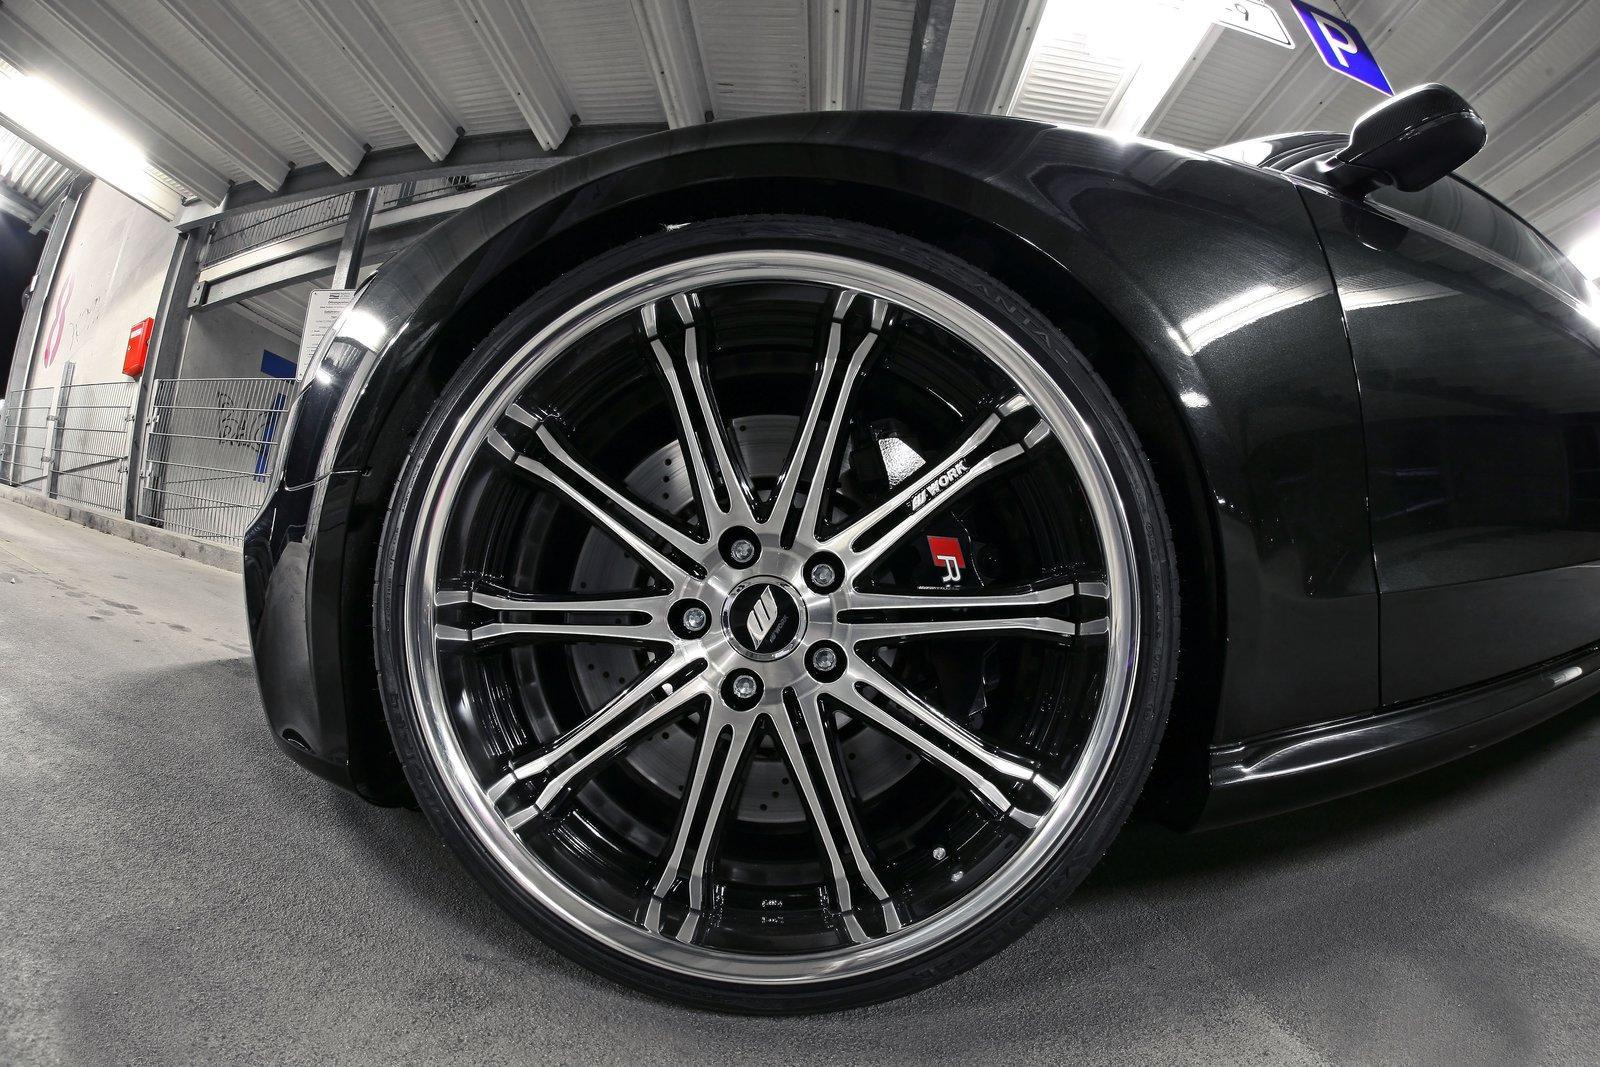 500hp Audi Rs5 By Senner Tuning Benautobahn